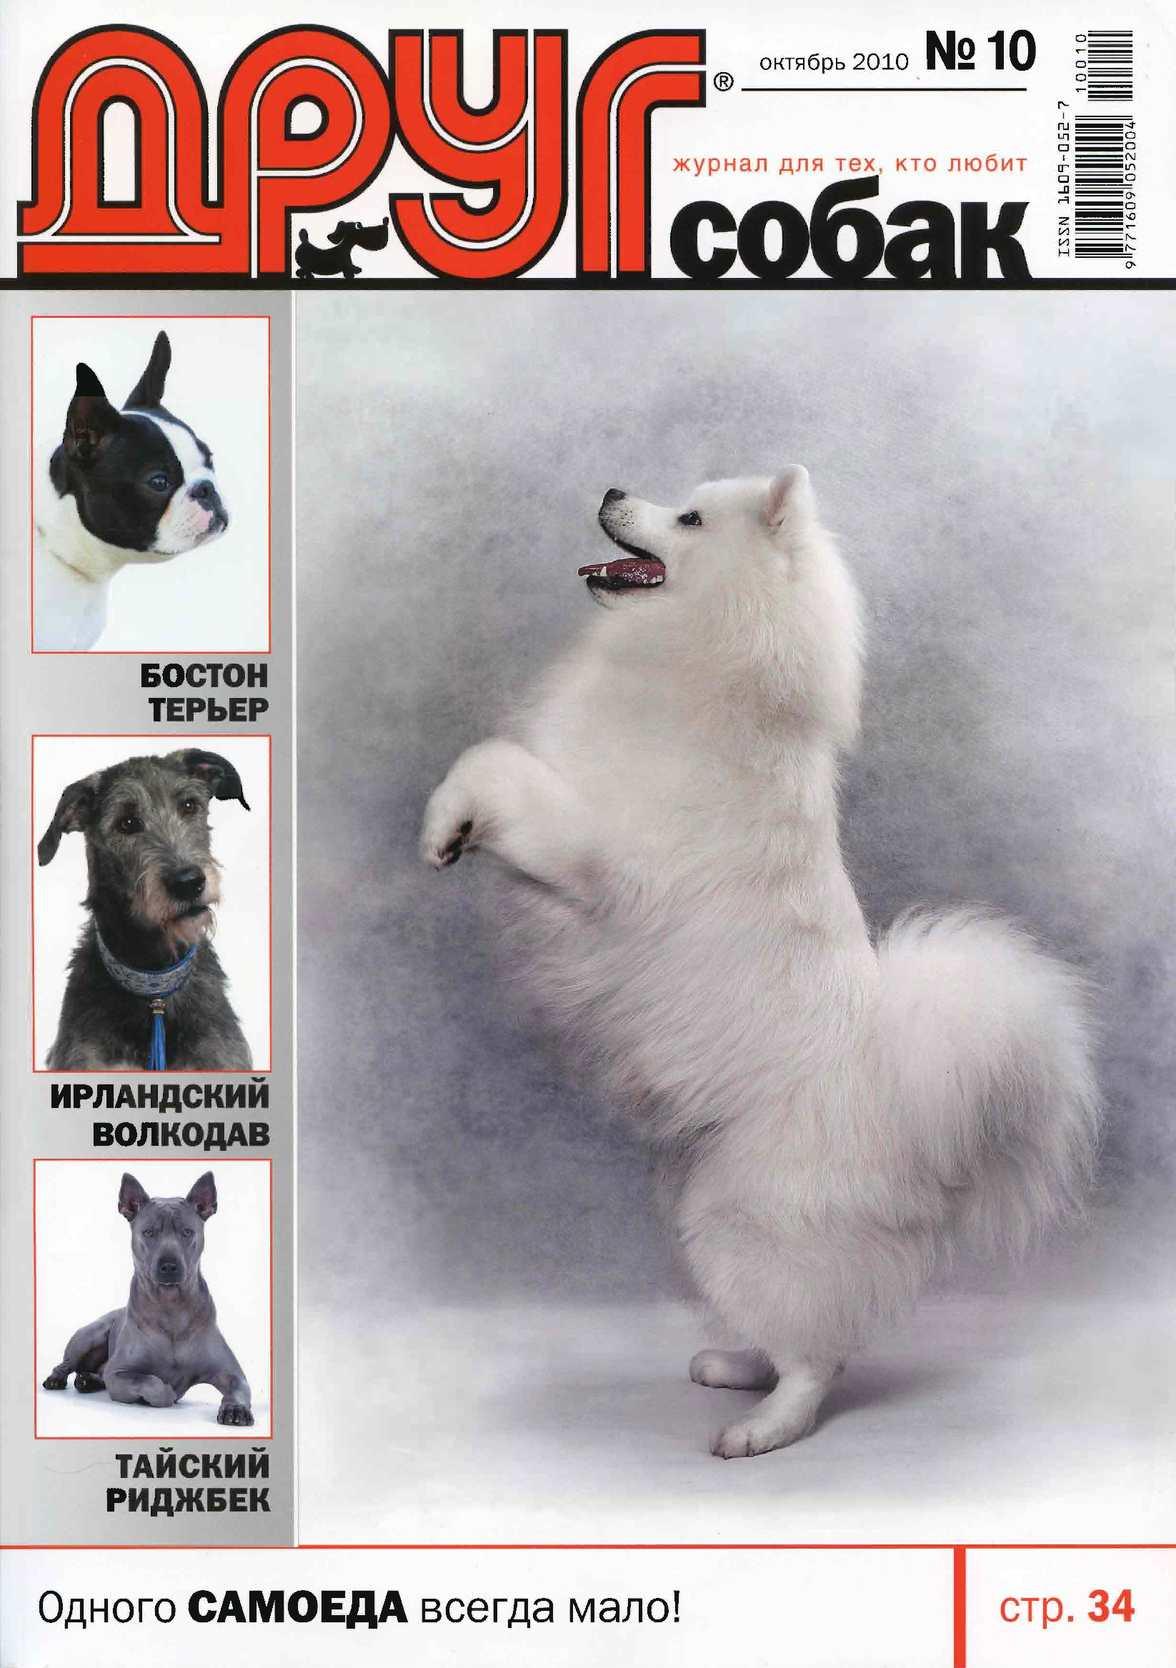 Calaméo - Друг собак 2010 - №10 7bd76abb7fe2d